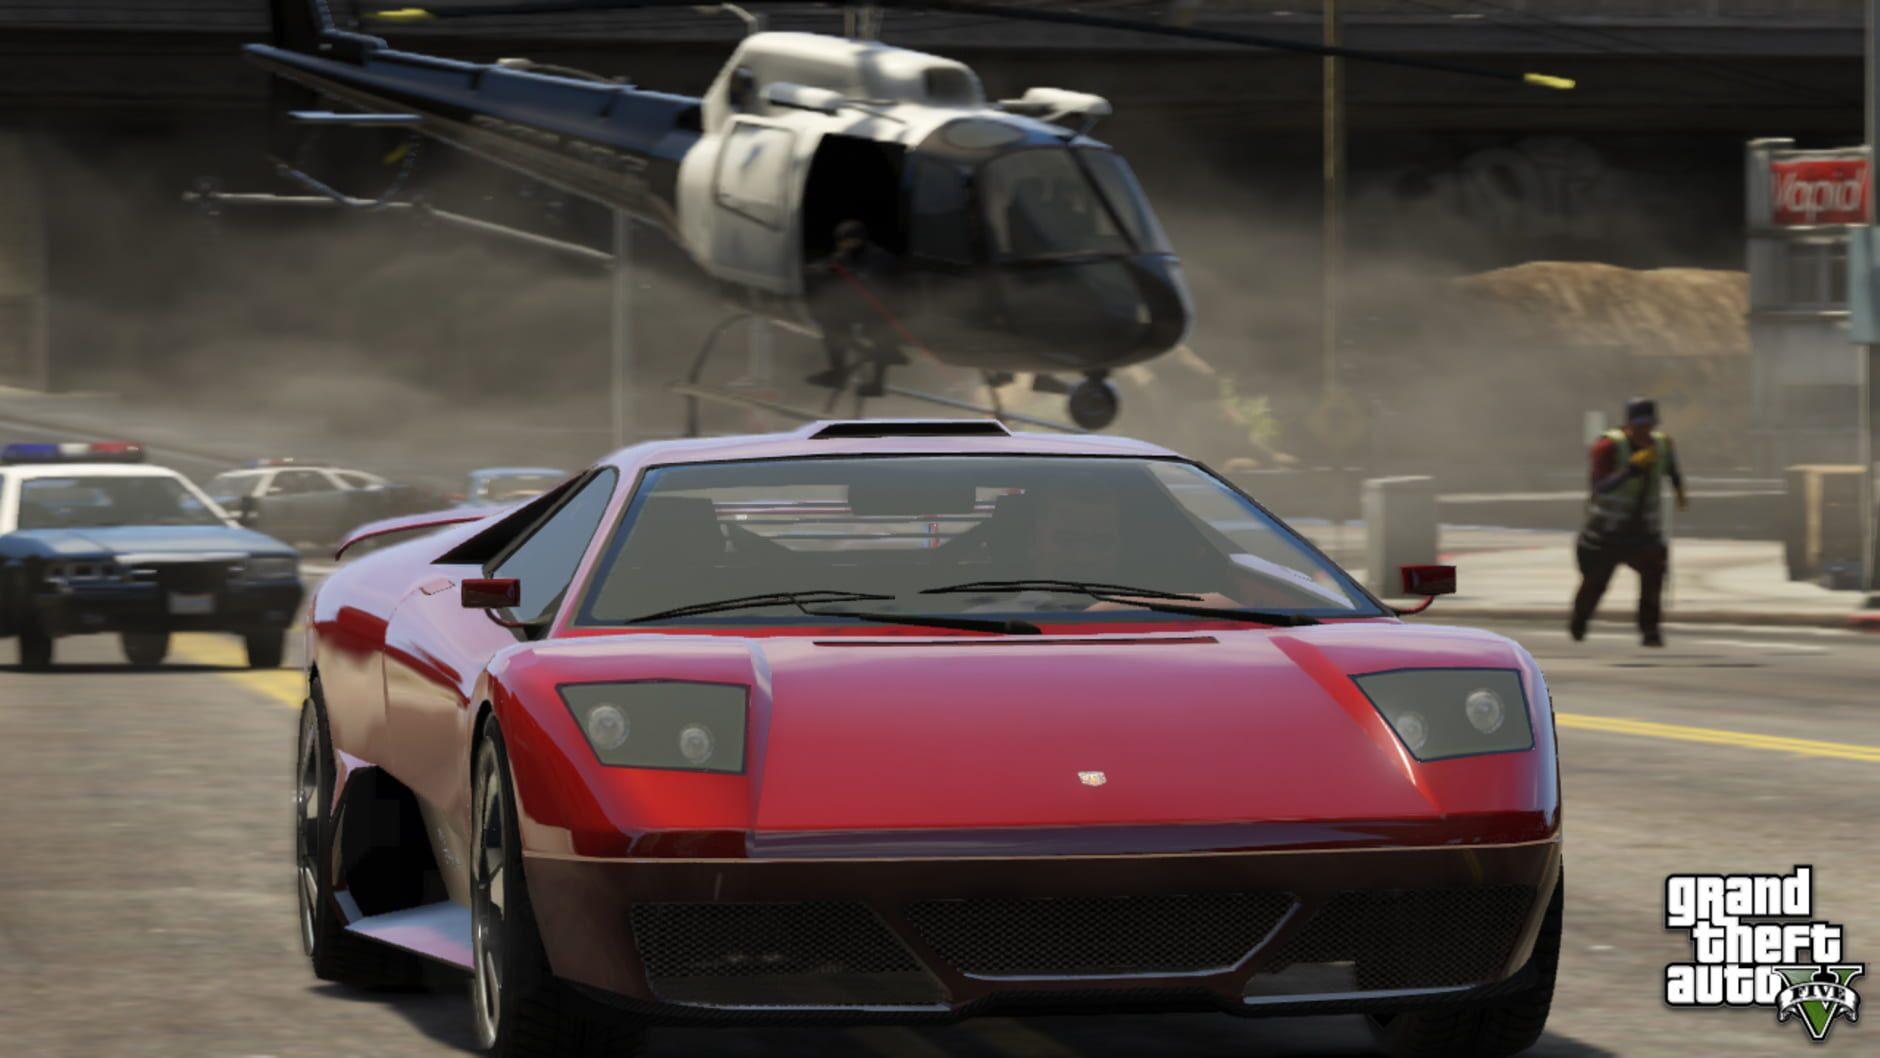 Grand Theft Auto V - 0